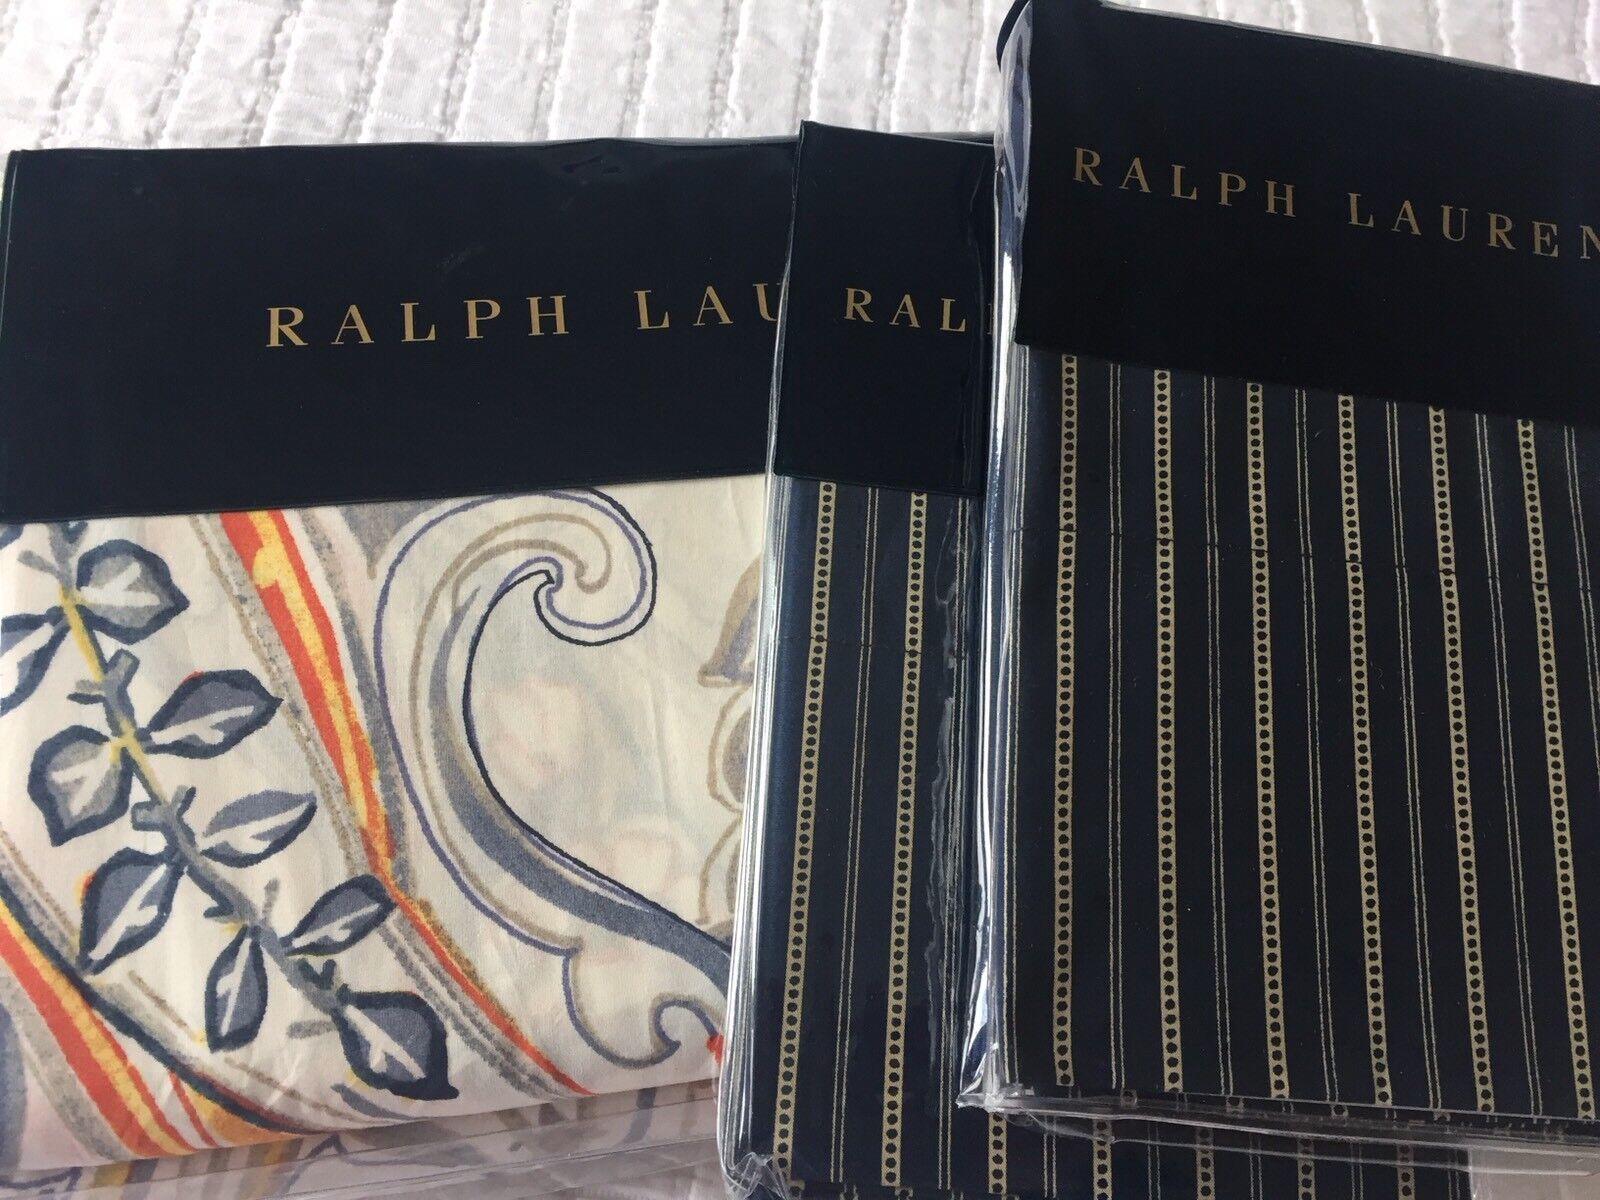 RALPH LAUREN RUE VANEAU TRAVIS CREAM DUVET COVER SET SUPERKING